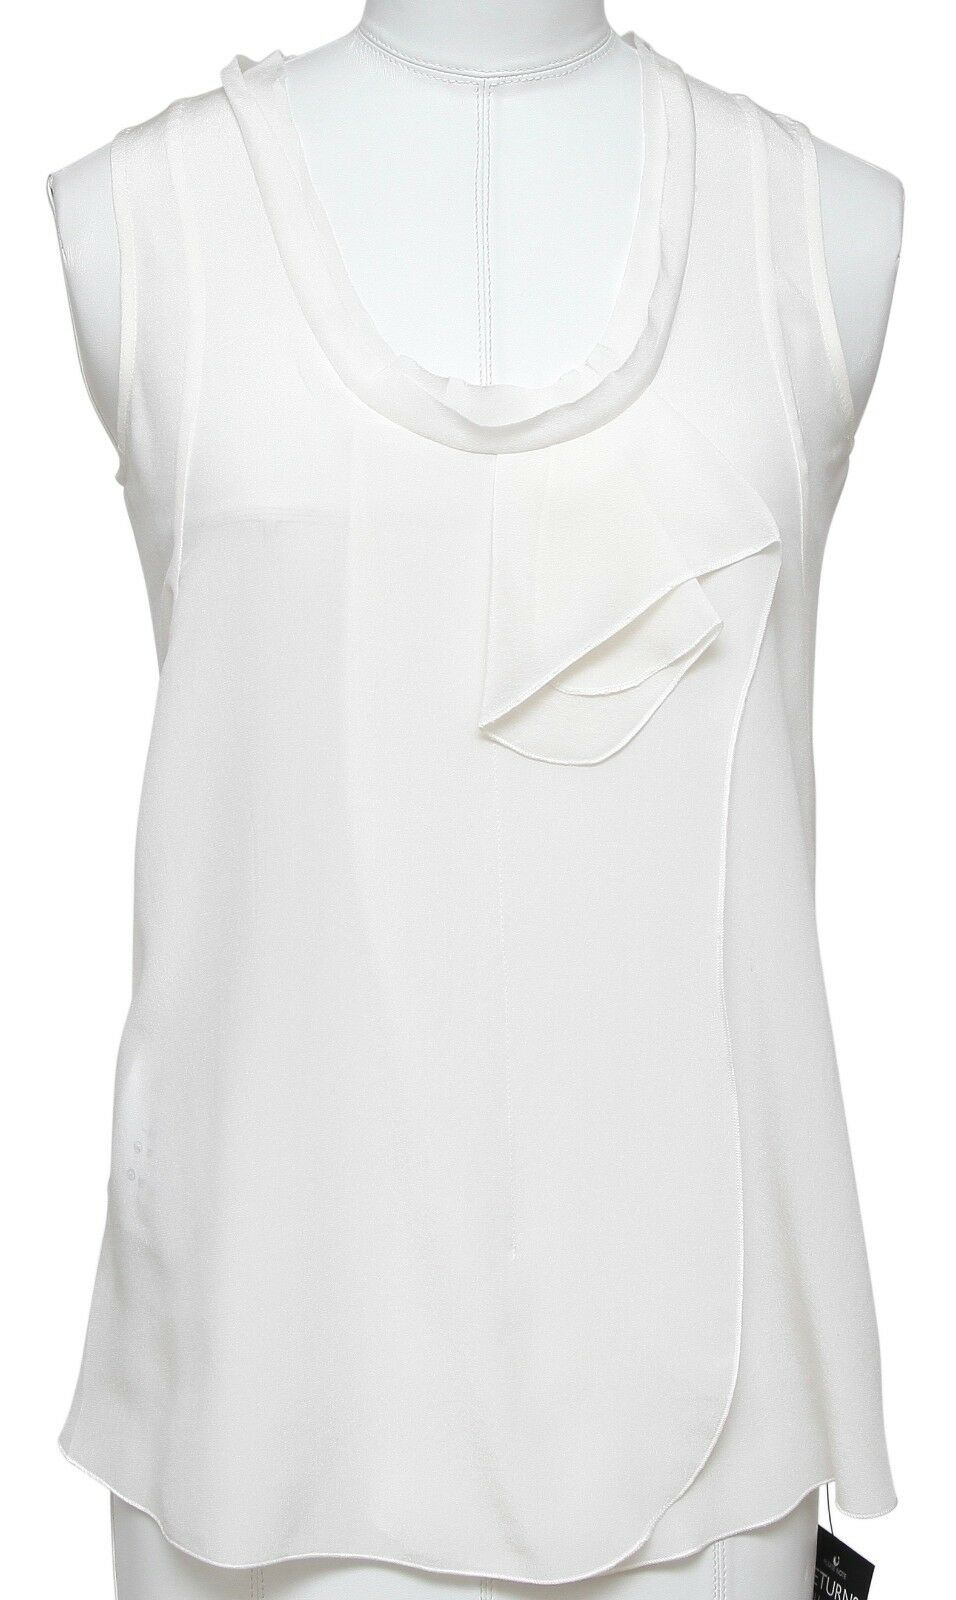 MIU MIU Top Blouse Shirt Sleeveless Silk Ivory Ruffle Sz 36 BNWT